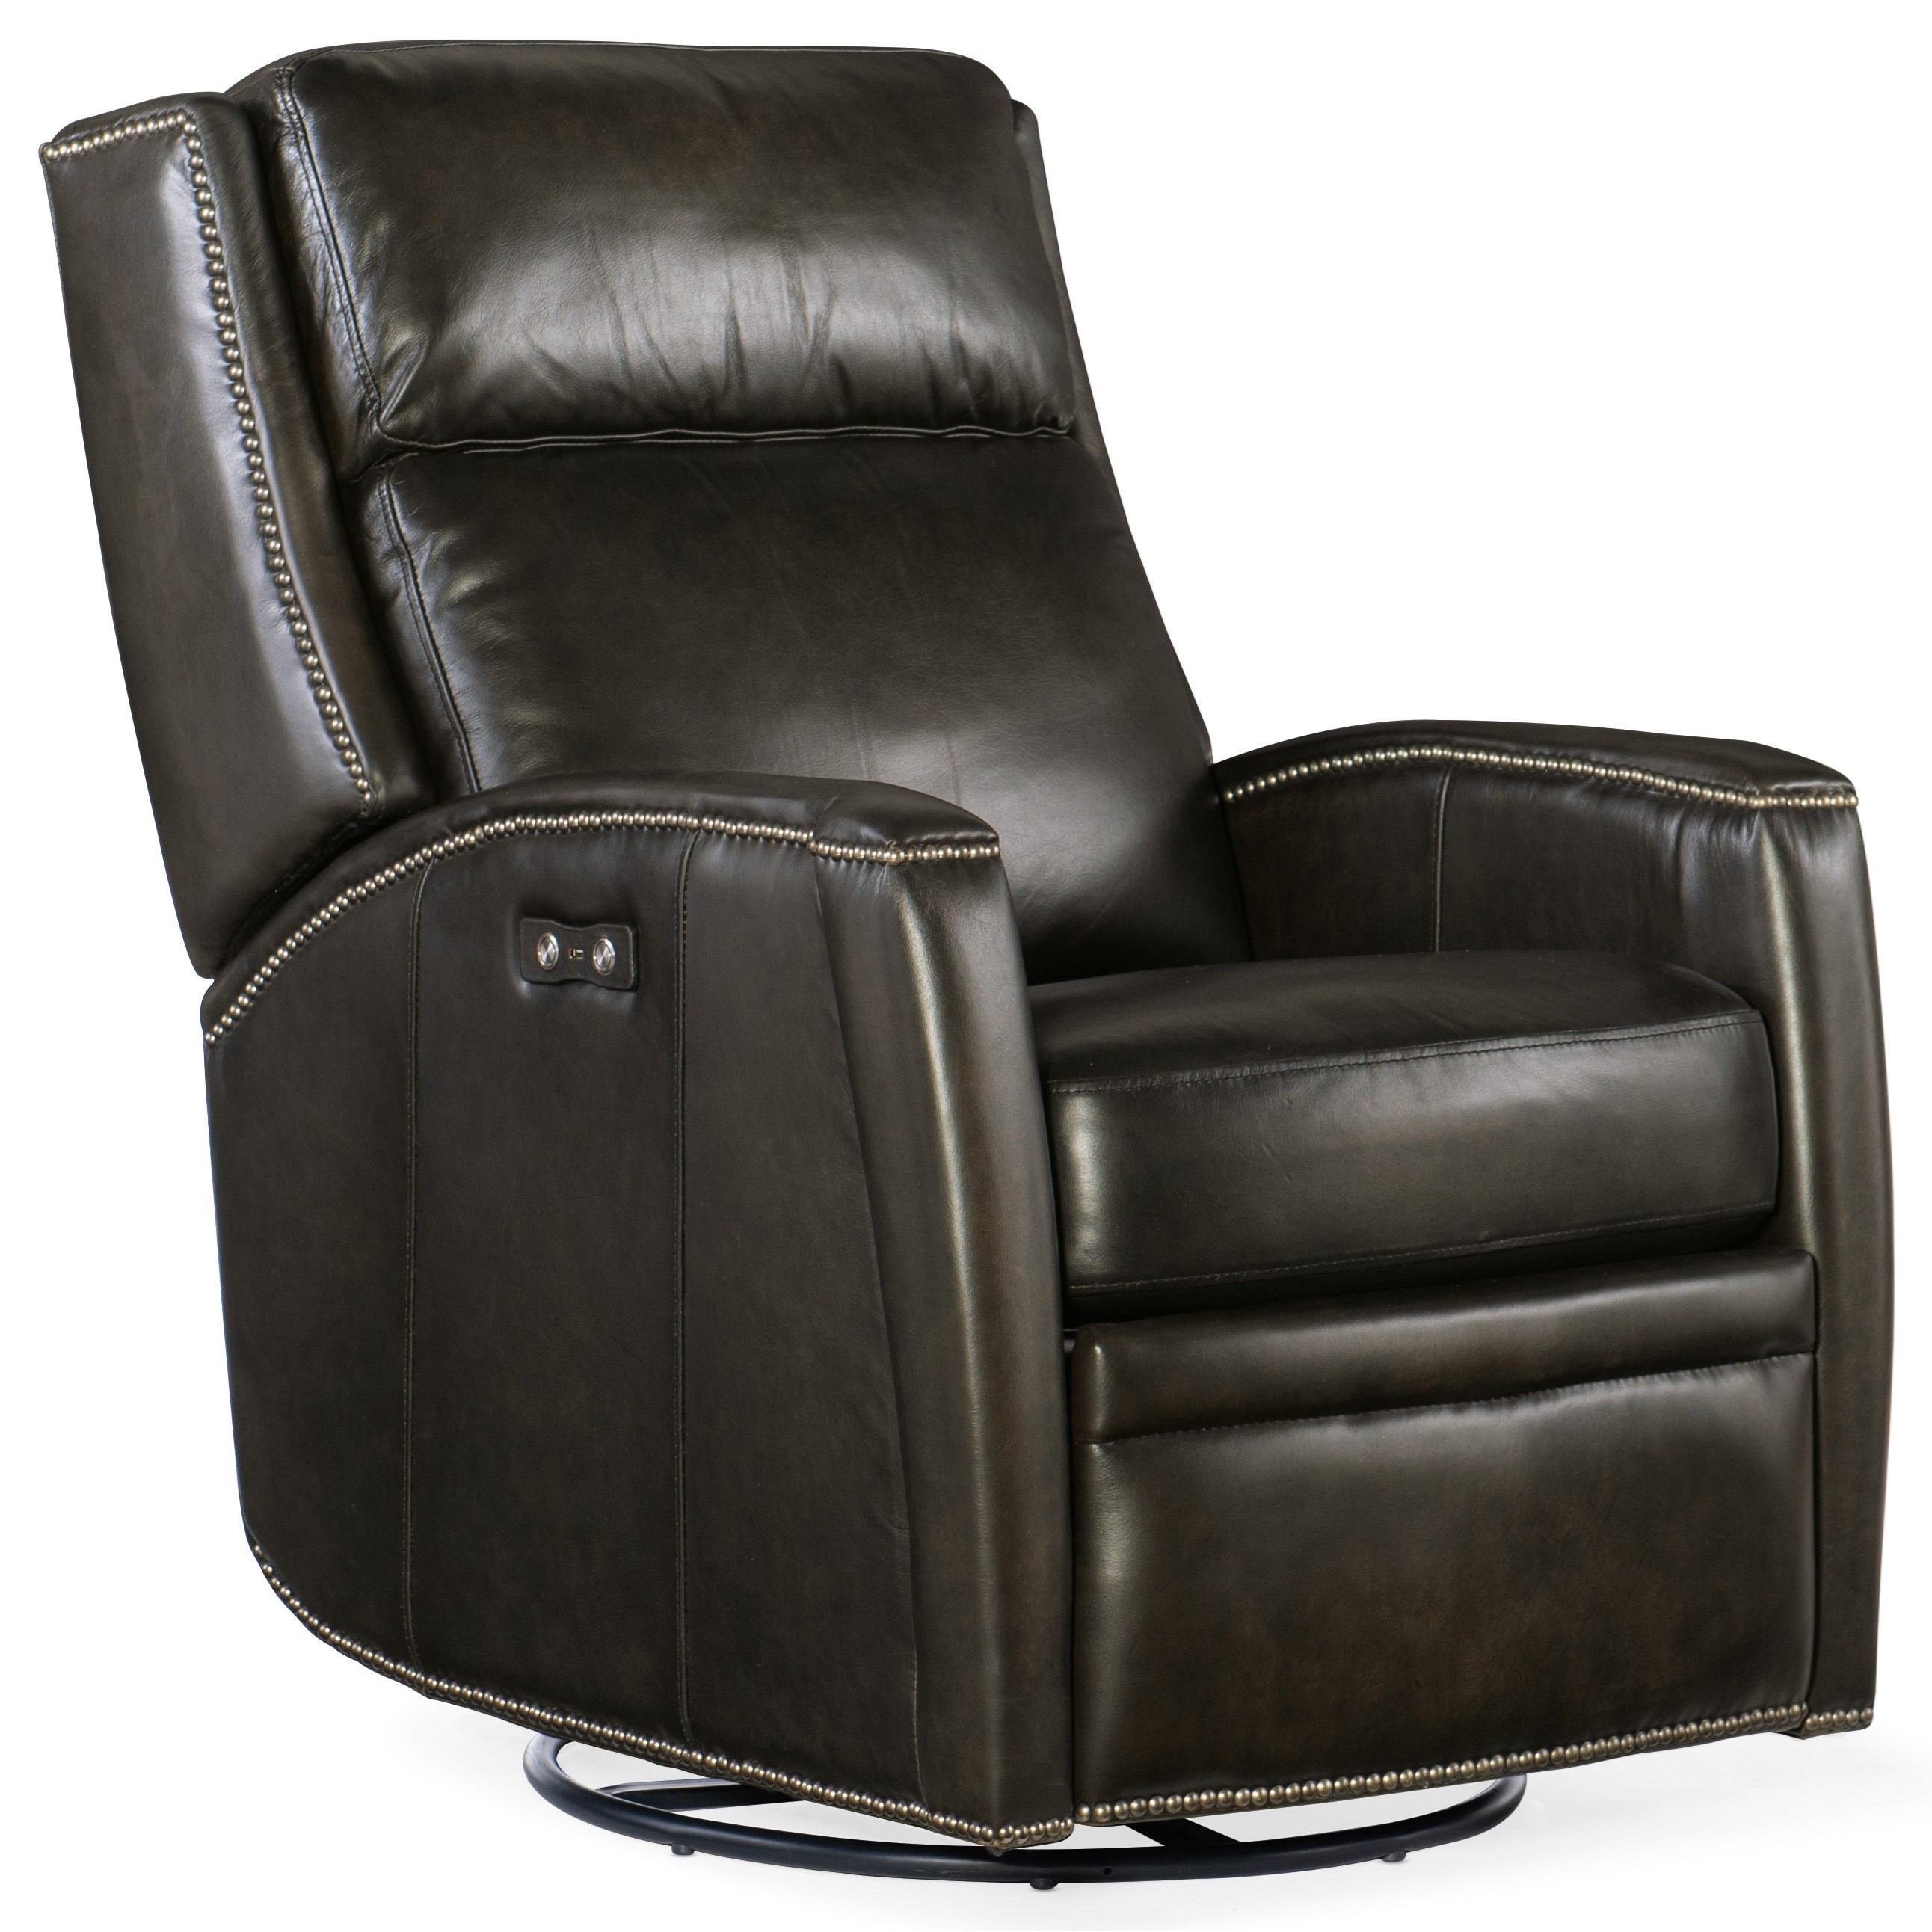 Declan Power Swivel Glider Recliner by Hooker Furniture at Miller Waldrop Furniture and Decor